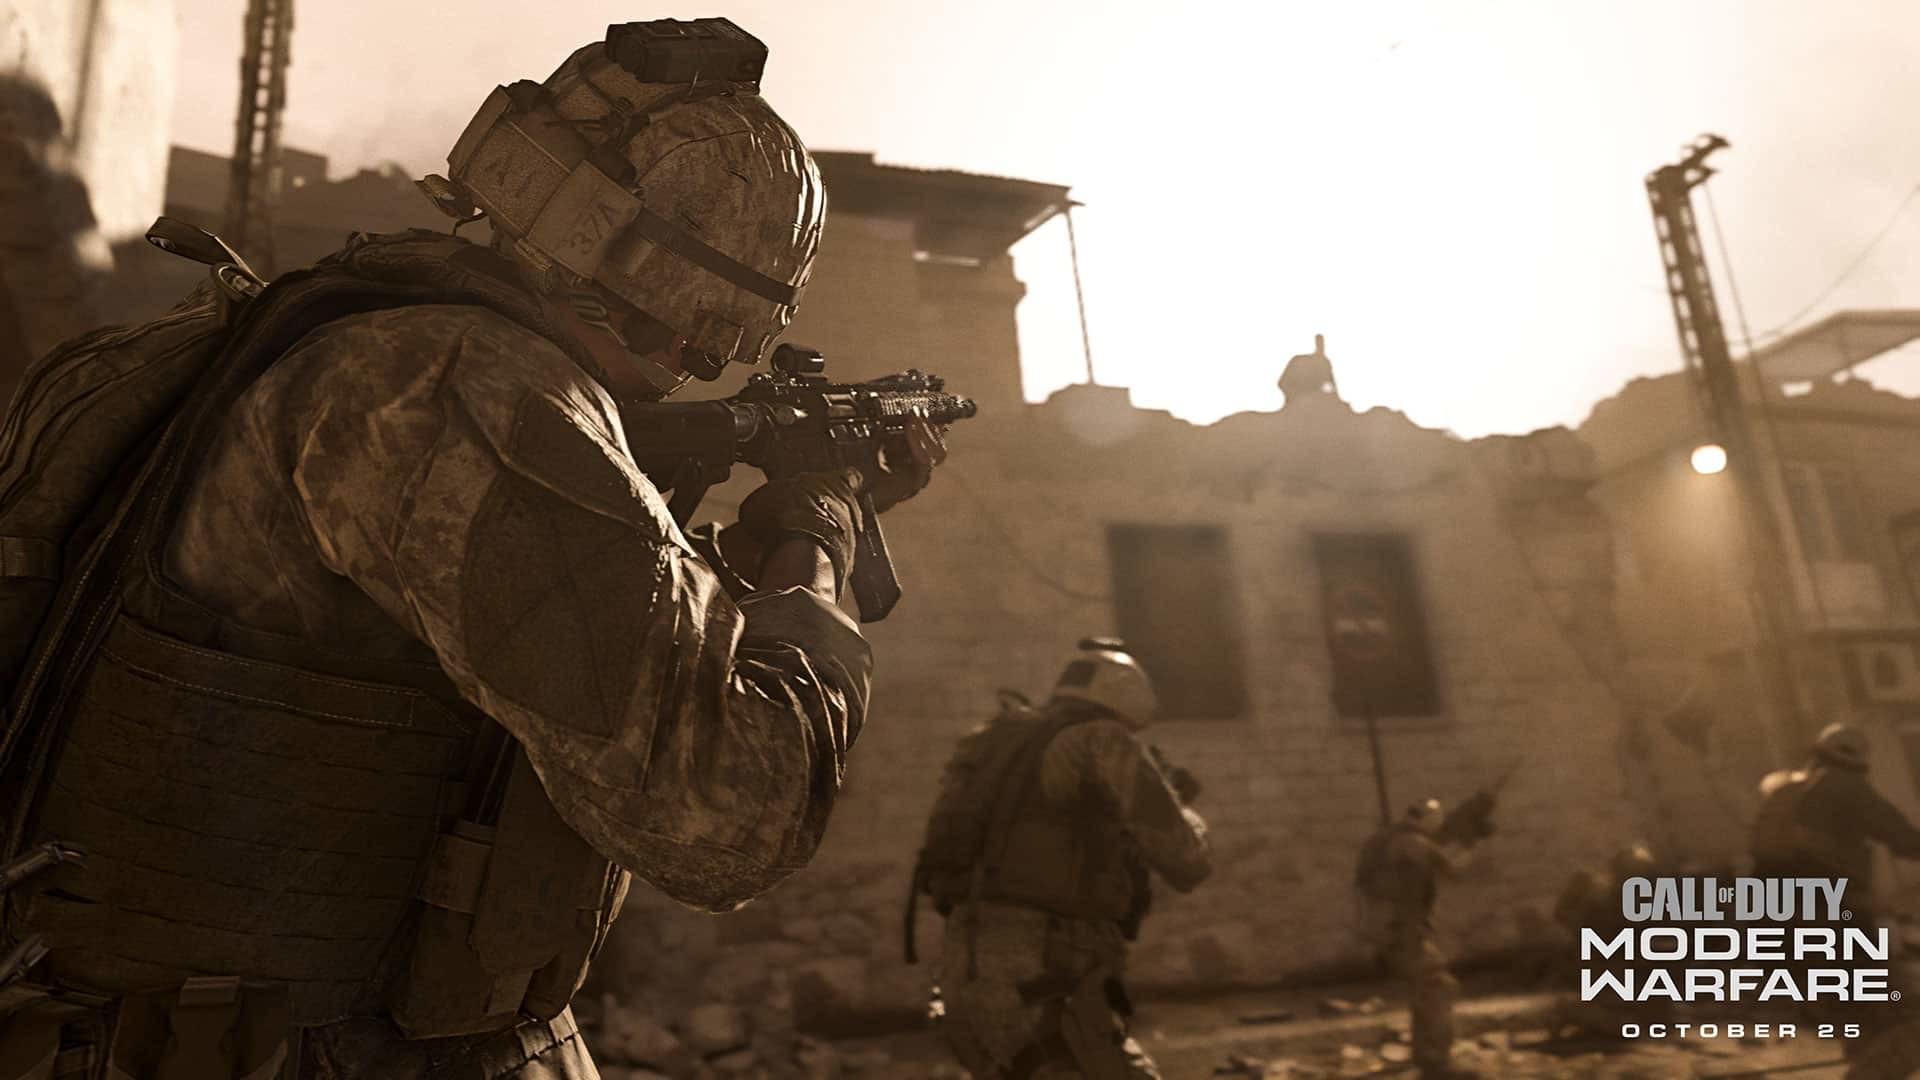 عرض كول اوف ديوتي مودرن وورفير الجماعي call of duty modern warfare multiplayer reveal open beta